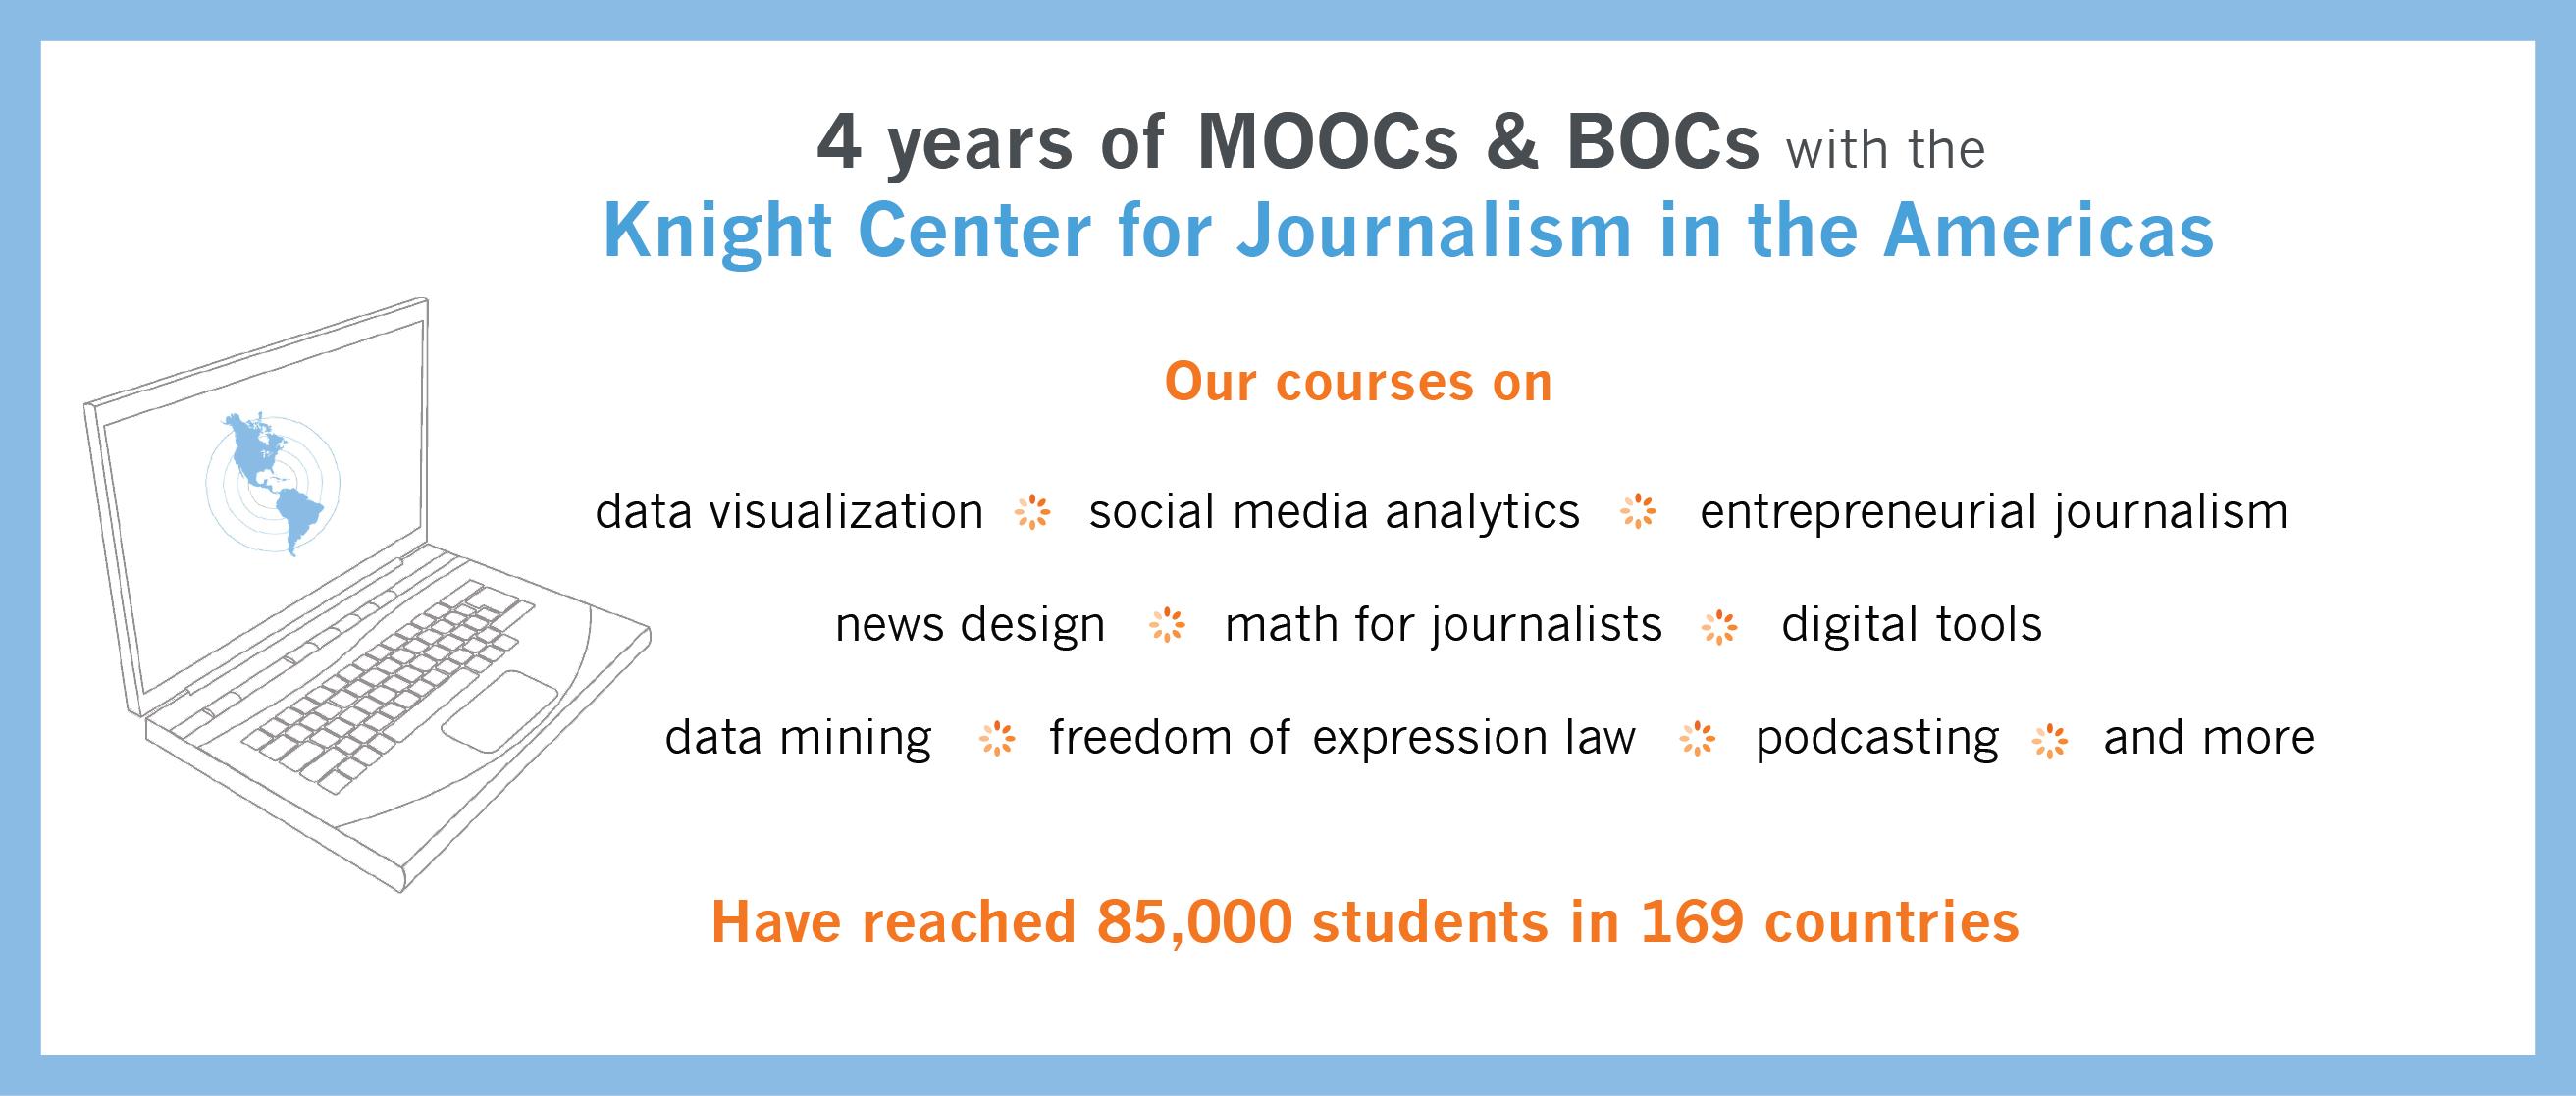 4 Years of Mooc